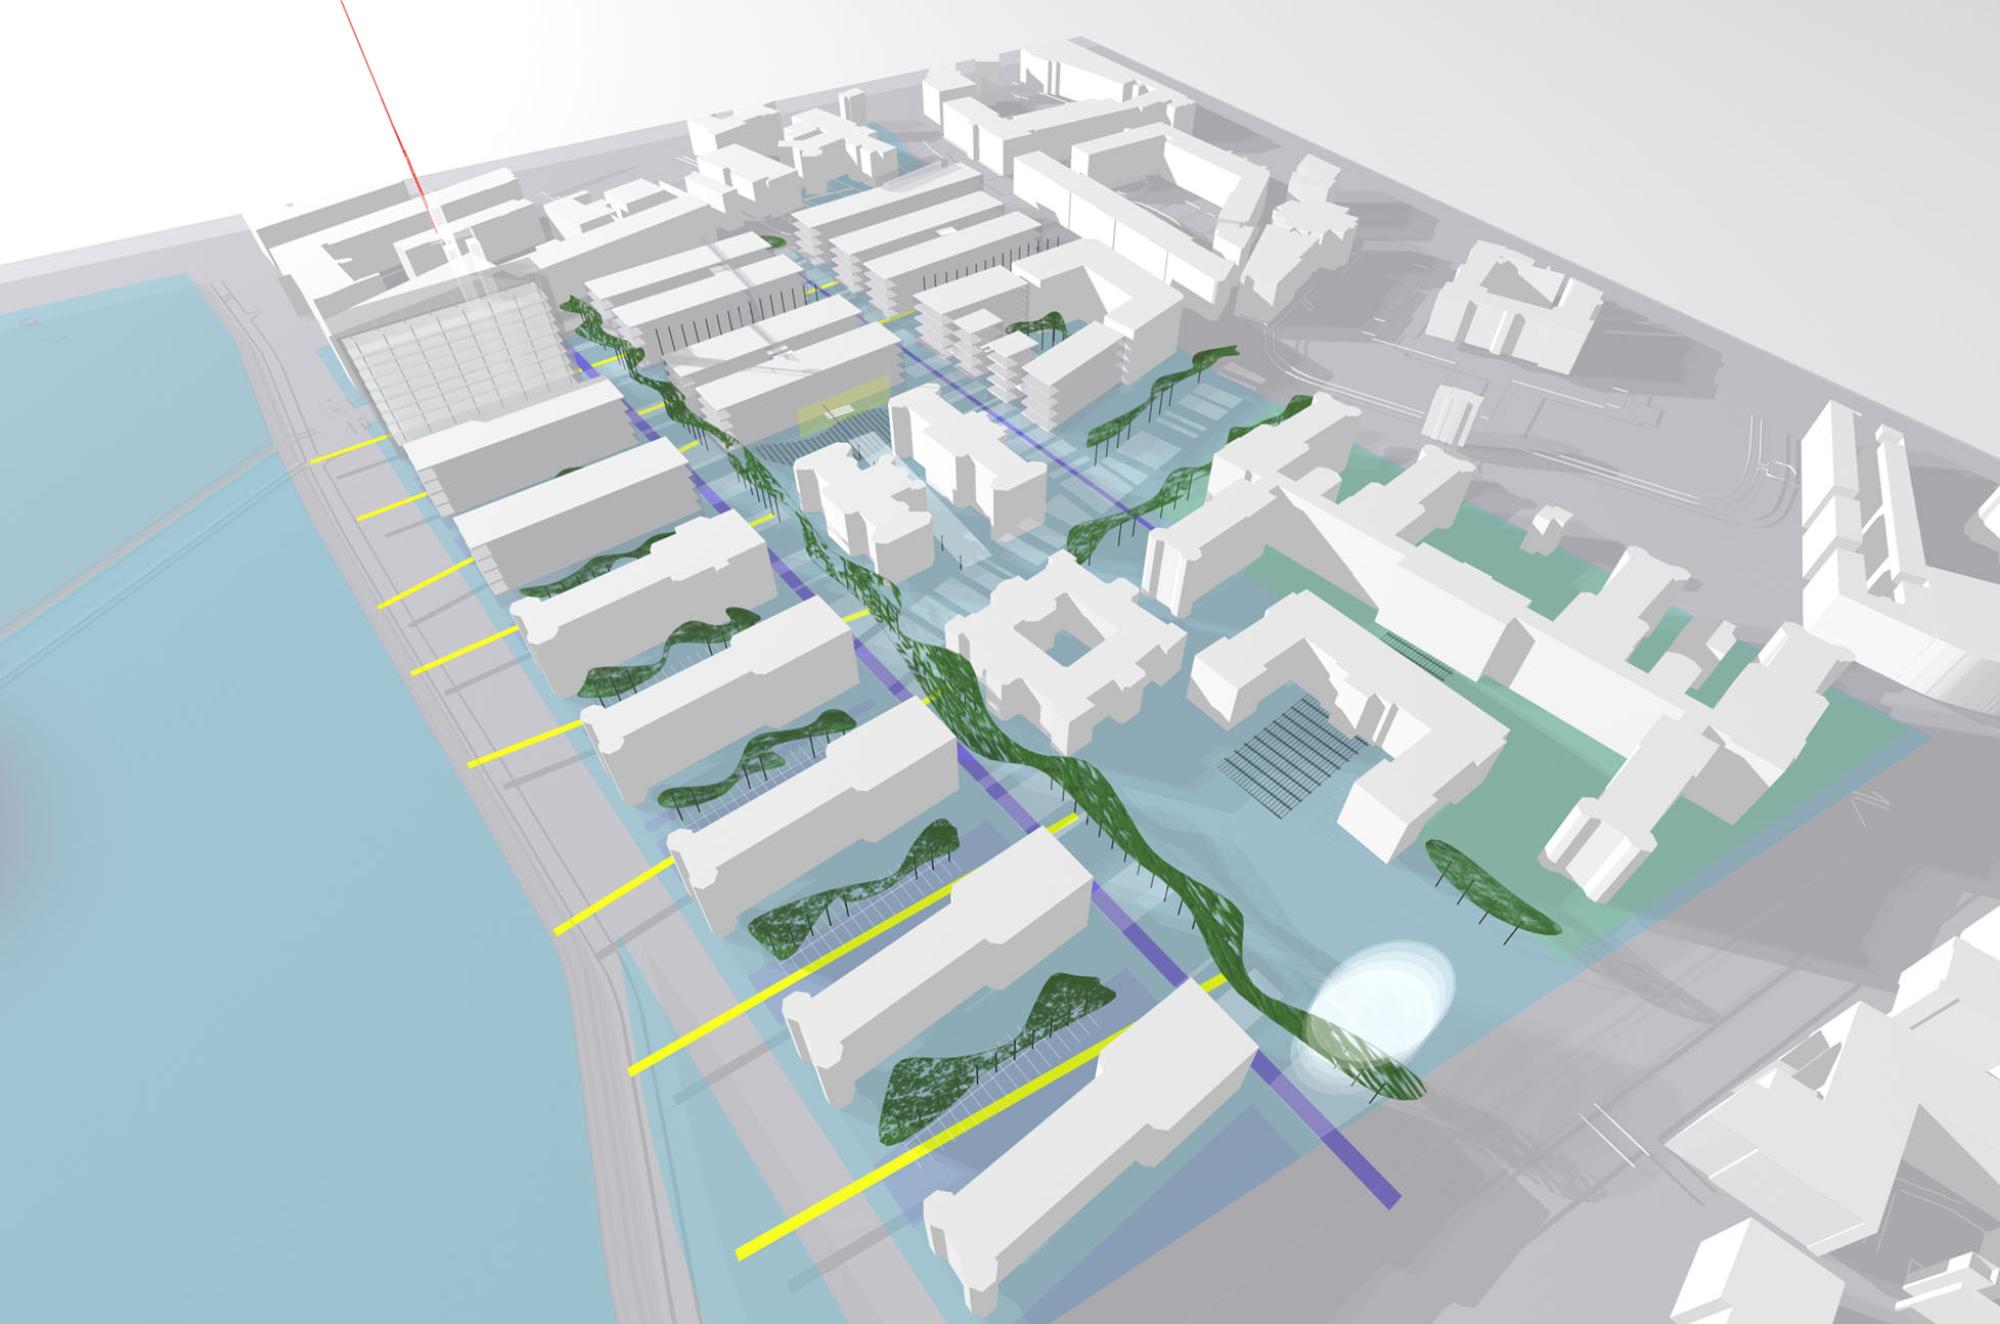 Royal Infirmary Masterplan Edinburgh